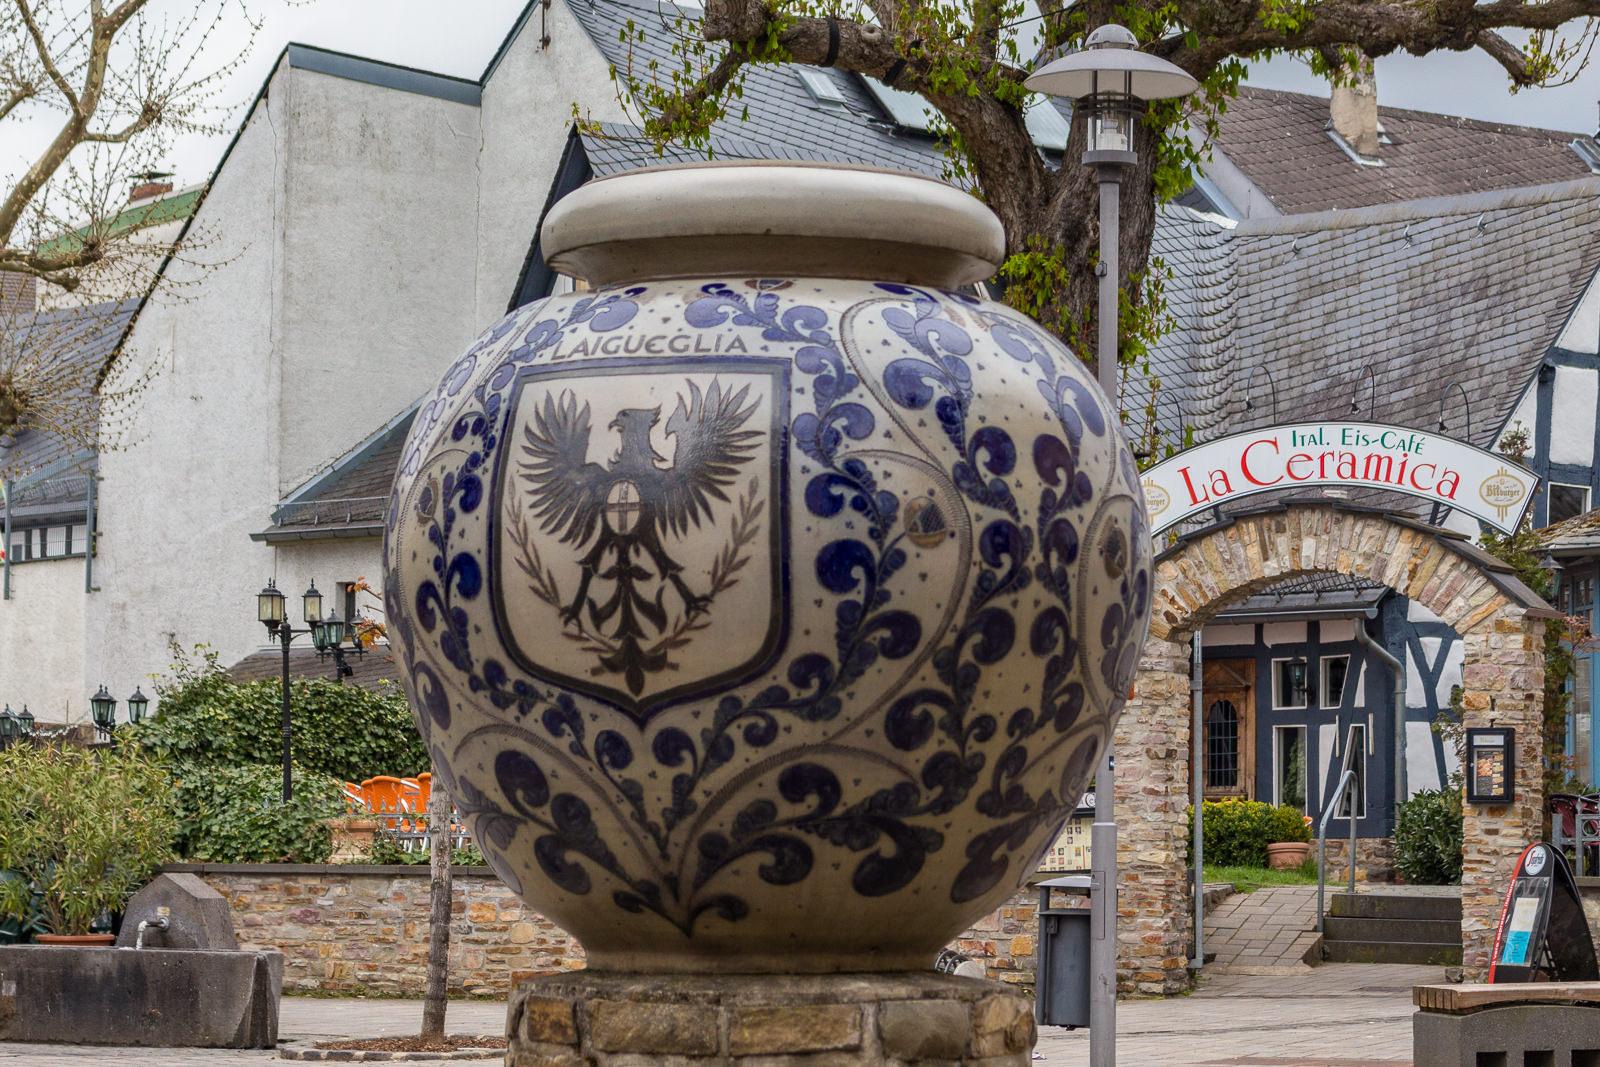 kannenbäckerland, #visitkeramik, Höhr-Grenzhausen, #RLPerleben, Ton, Keramik, Keramikkunst, Künstler, Manufaktur, Töpfern, Künstlergasse